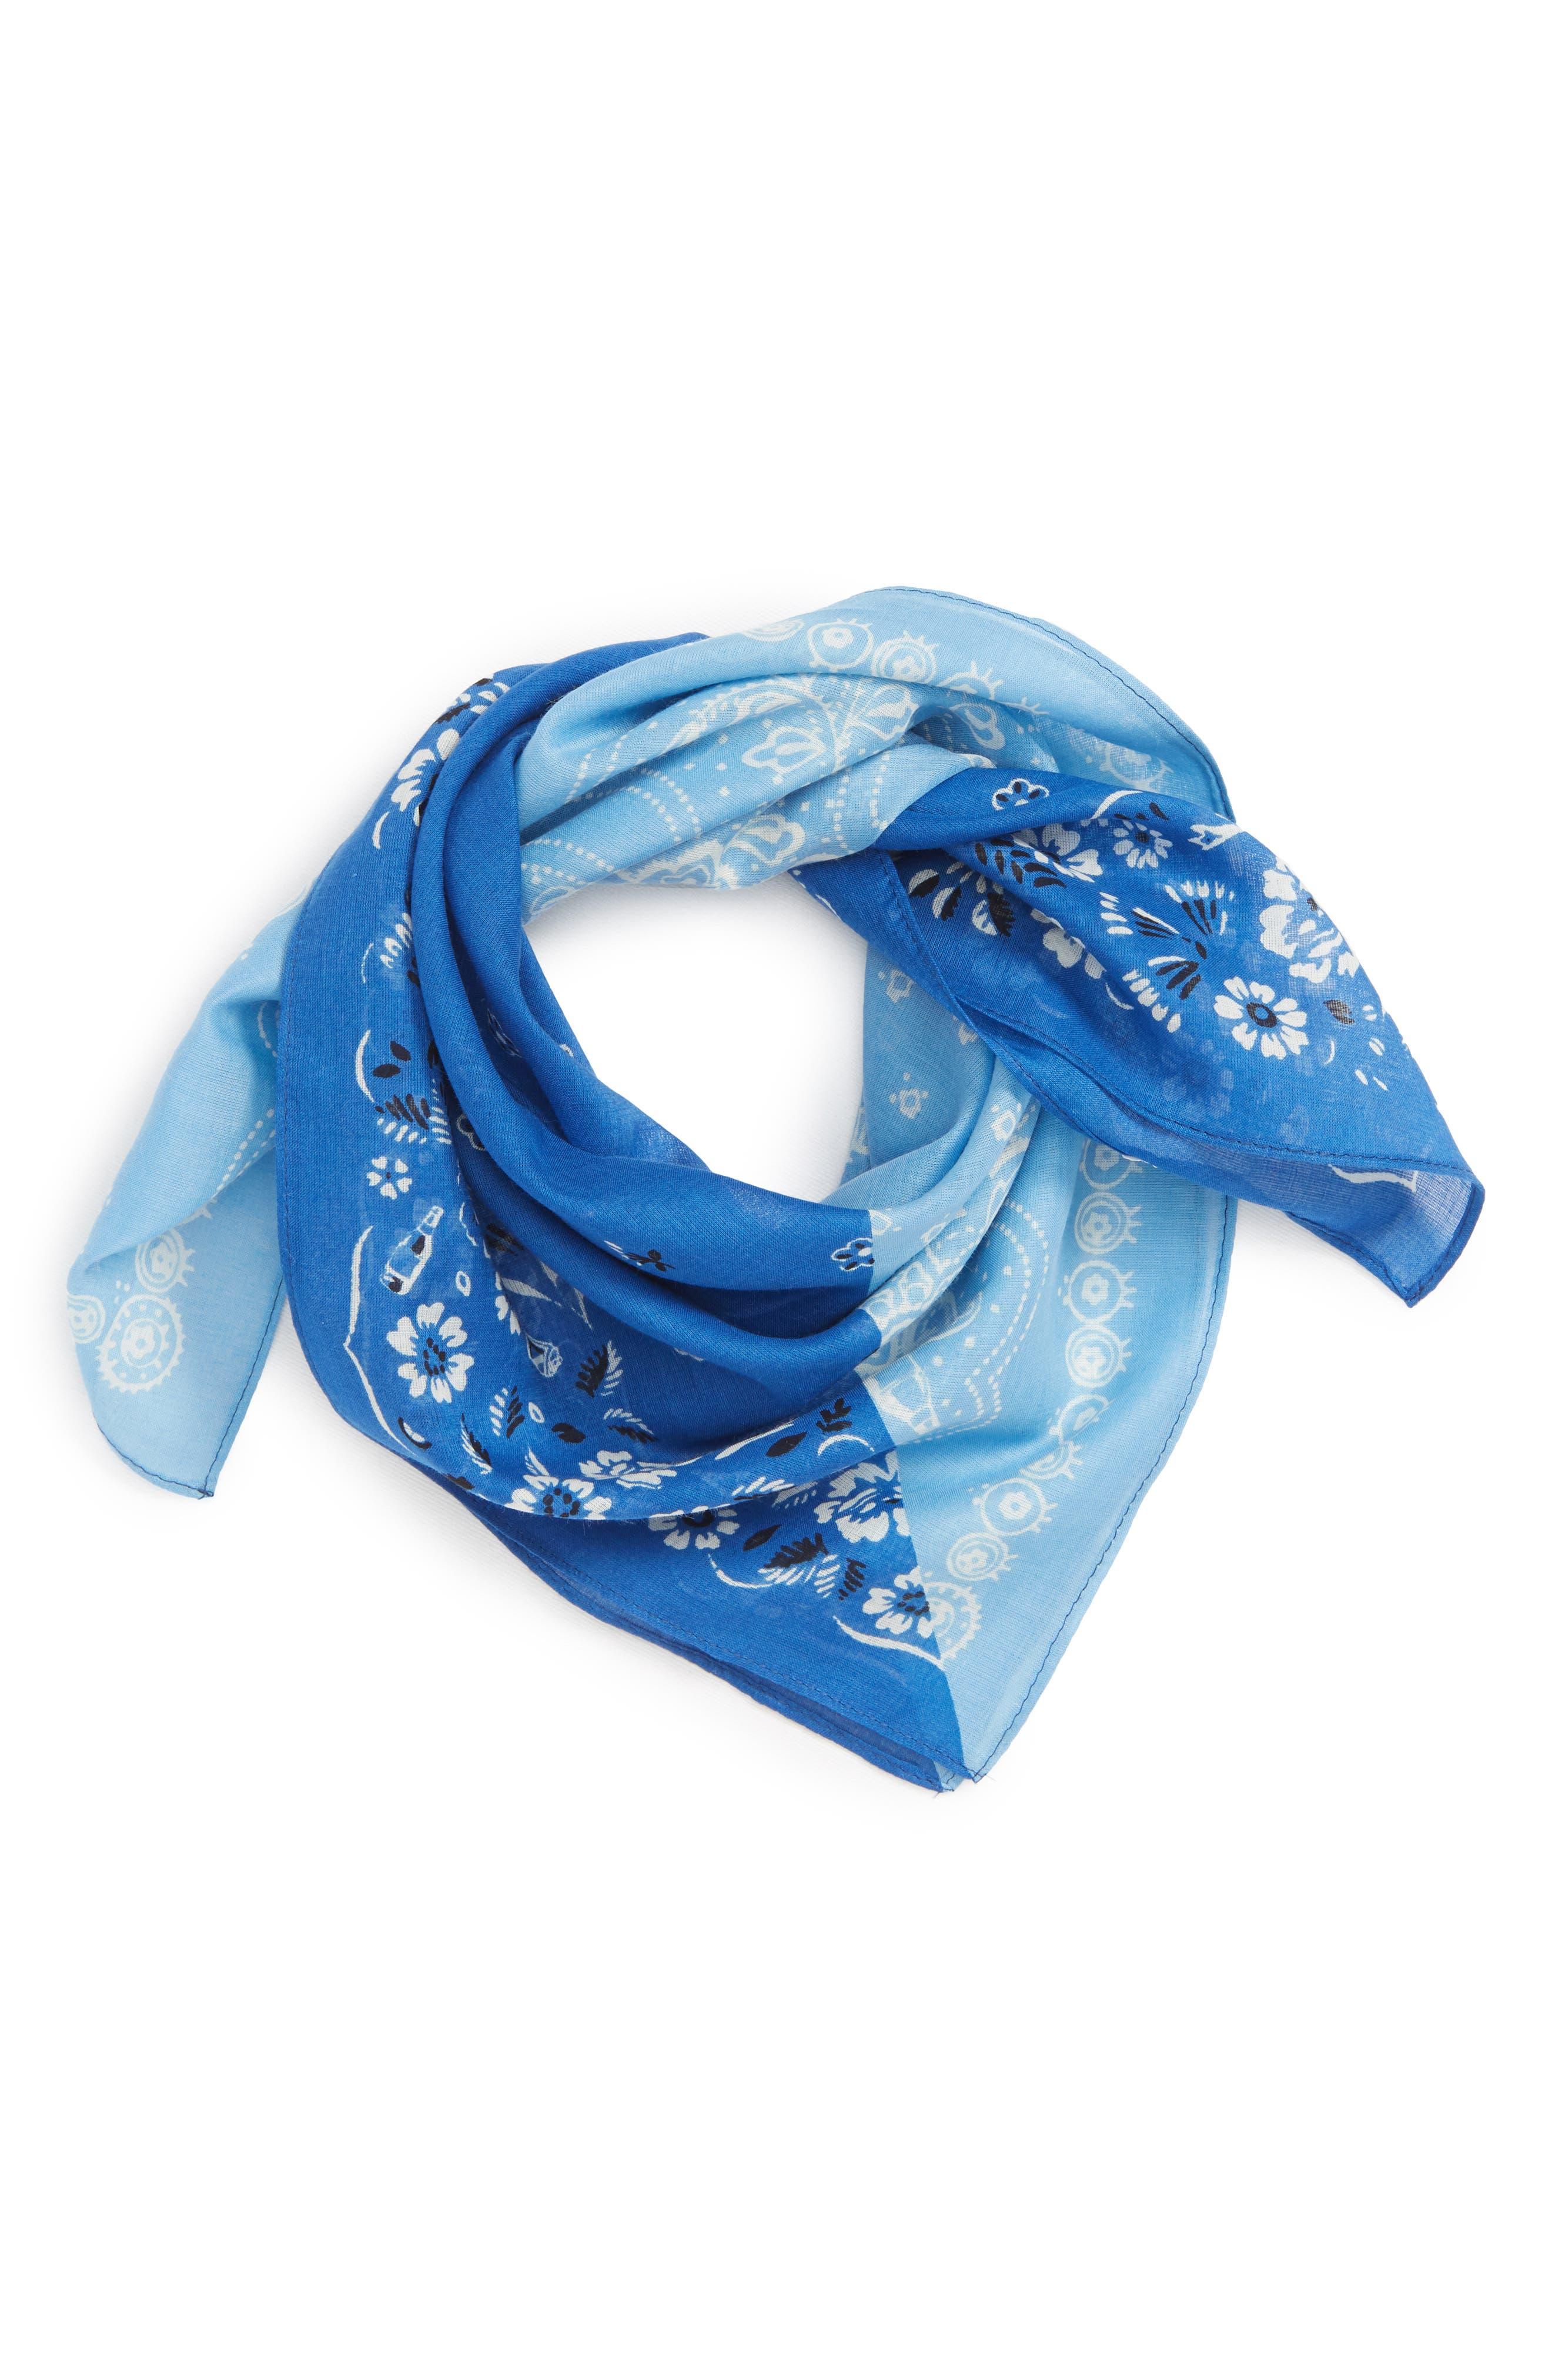 Simons Sky blue tie-scarf elastic 5YjLRcU